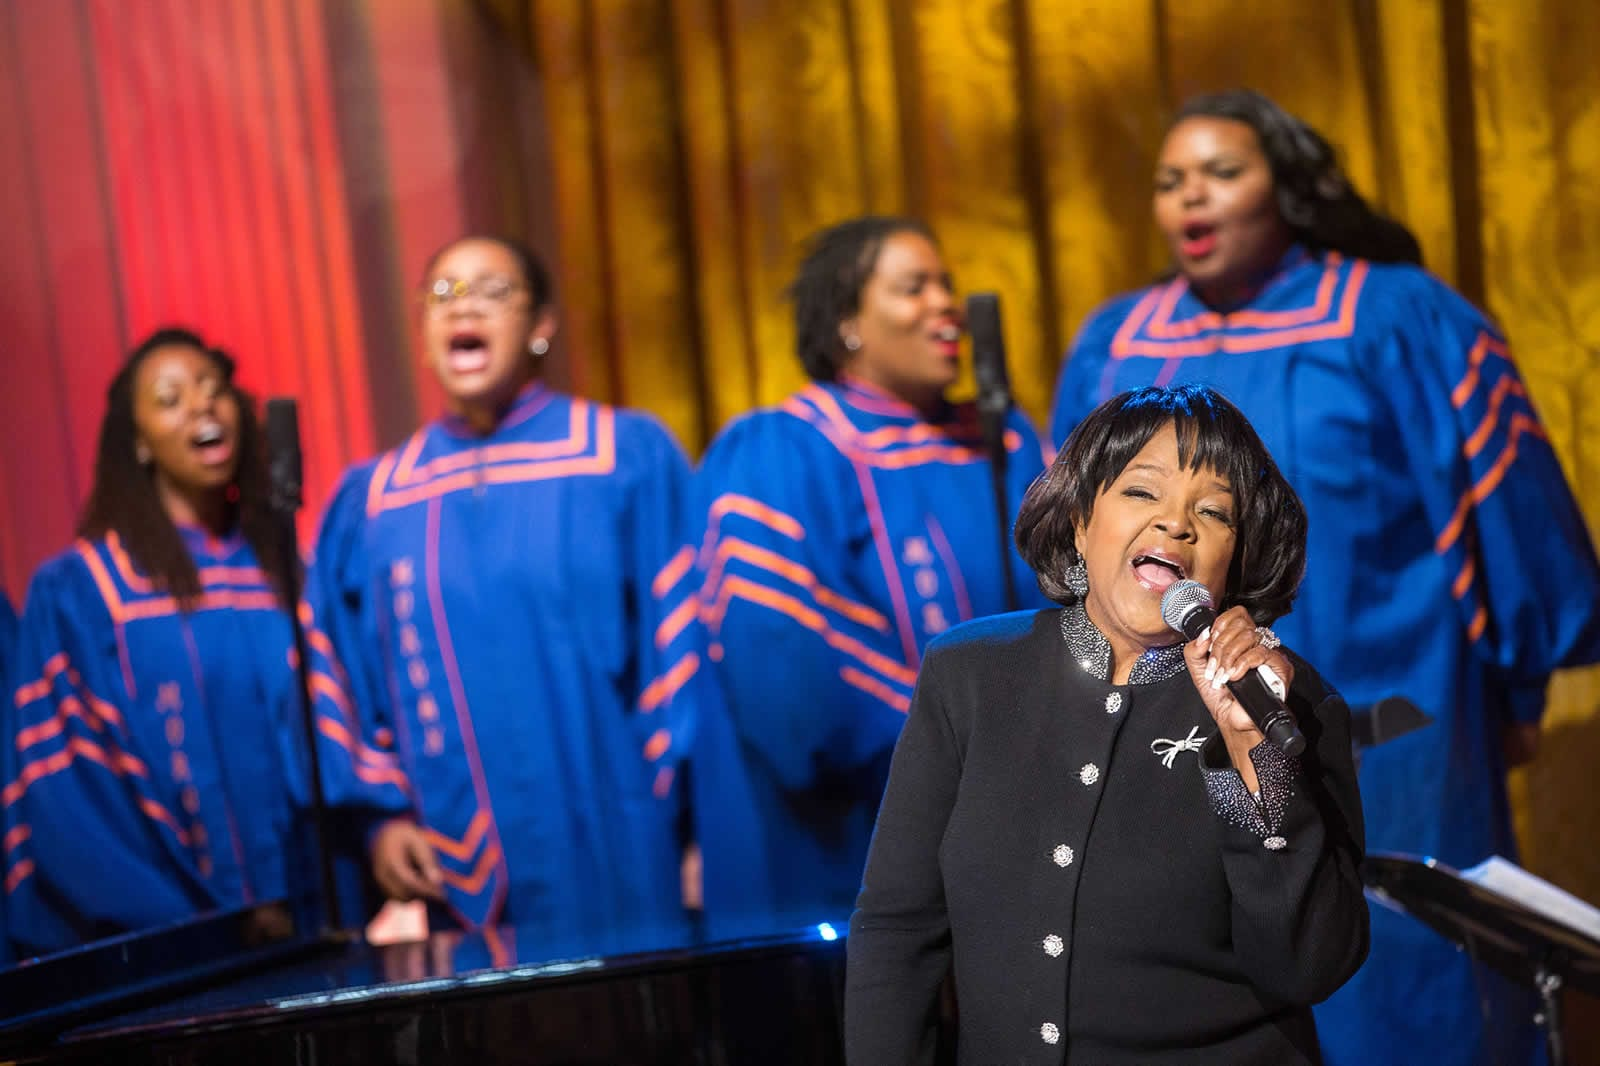 Assister Une Messe Gospel Harlem Et New York